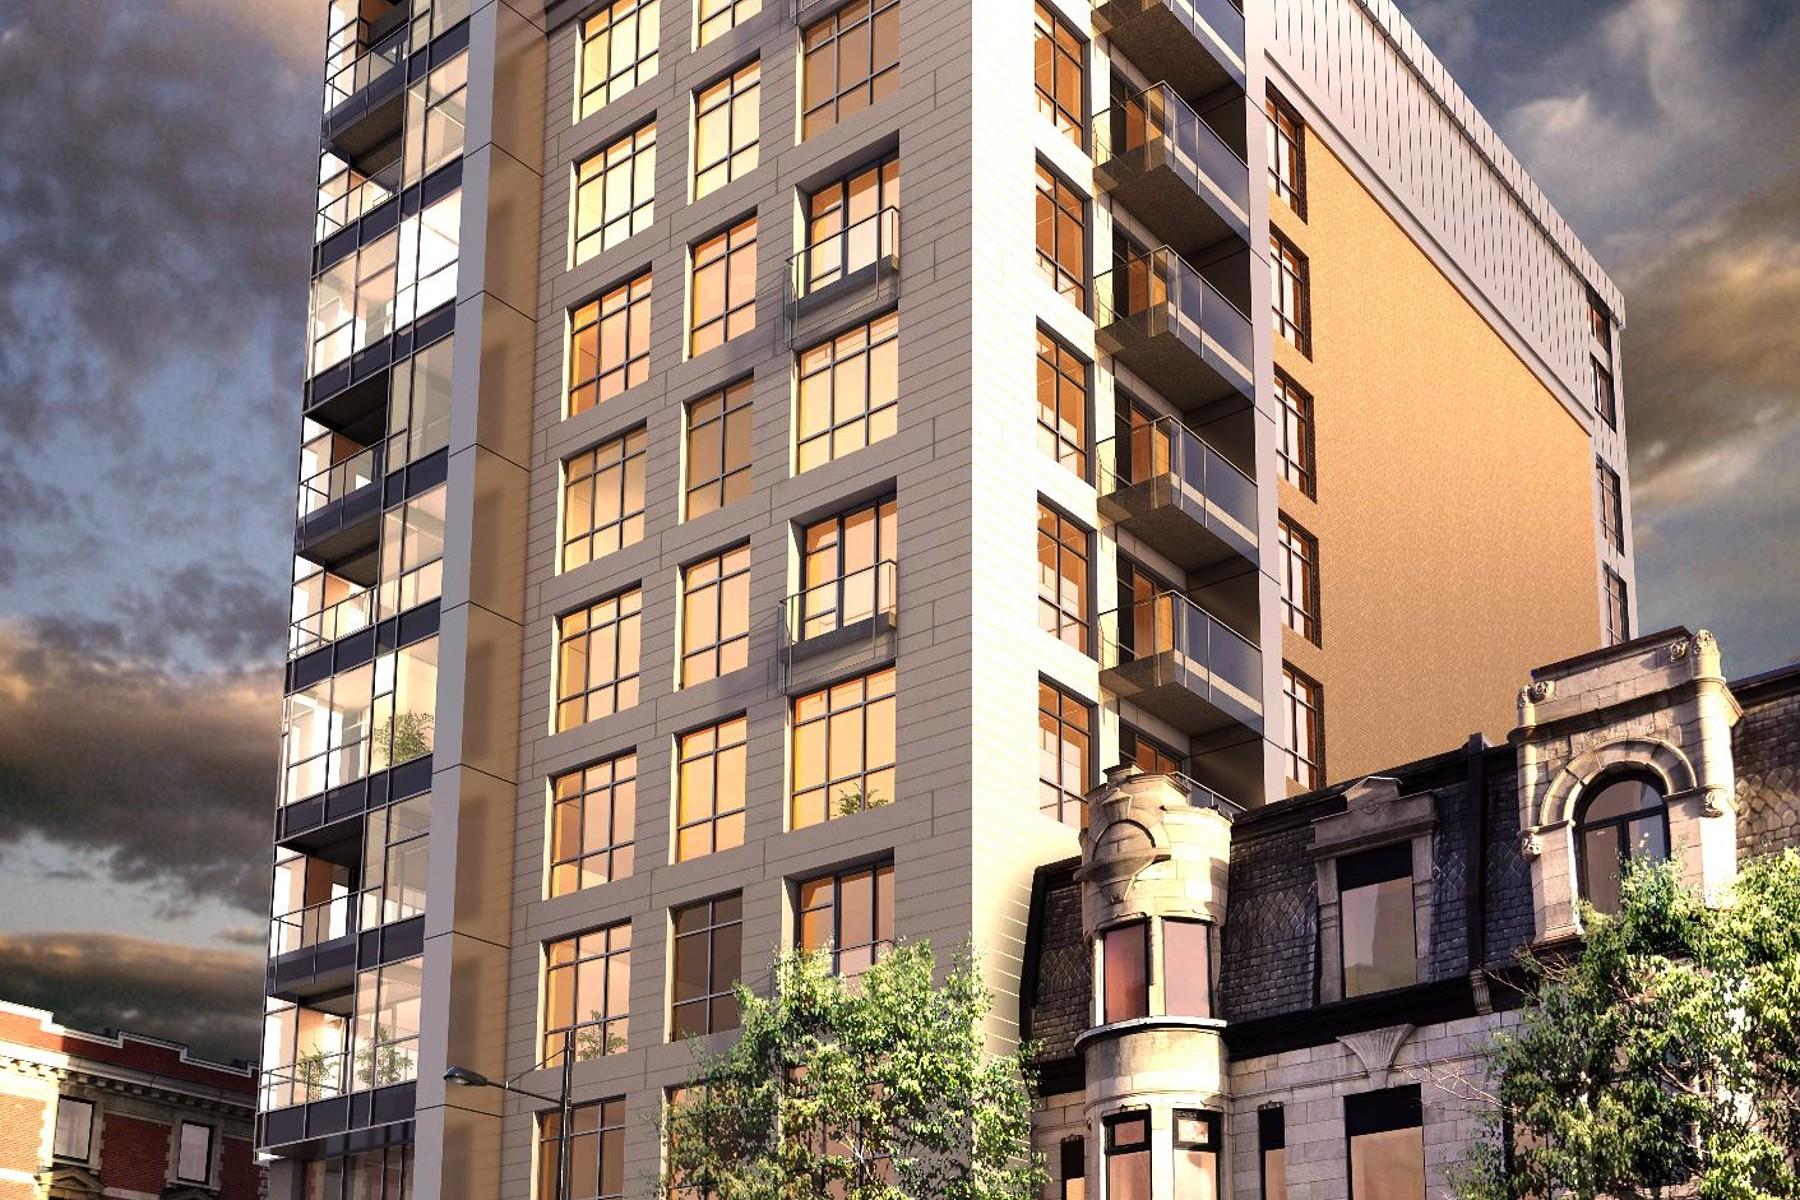 Condomínio para Venda às Ville-Marie (Montréal), Montréal 1420 Rue Sherbrooke O., Apt. 603 Montreal, Quebec H3G1K4 Canadá